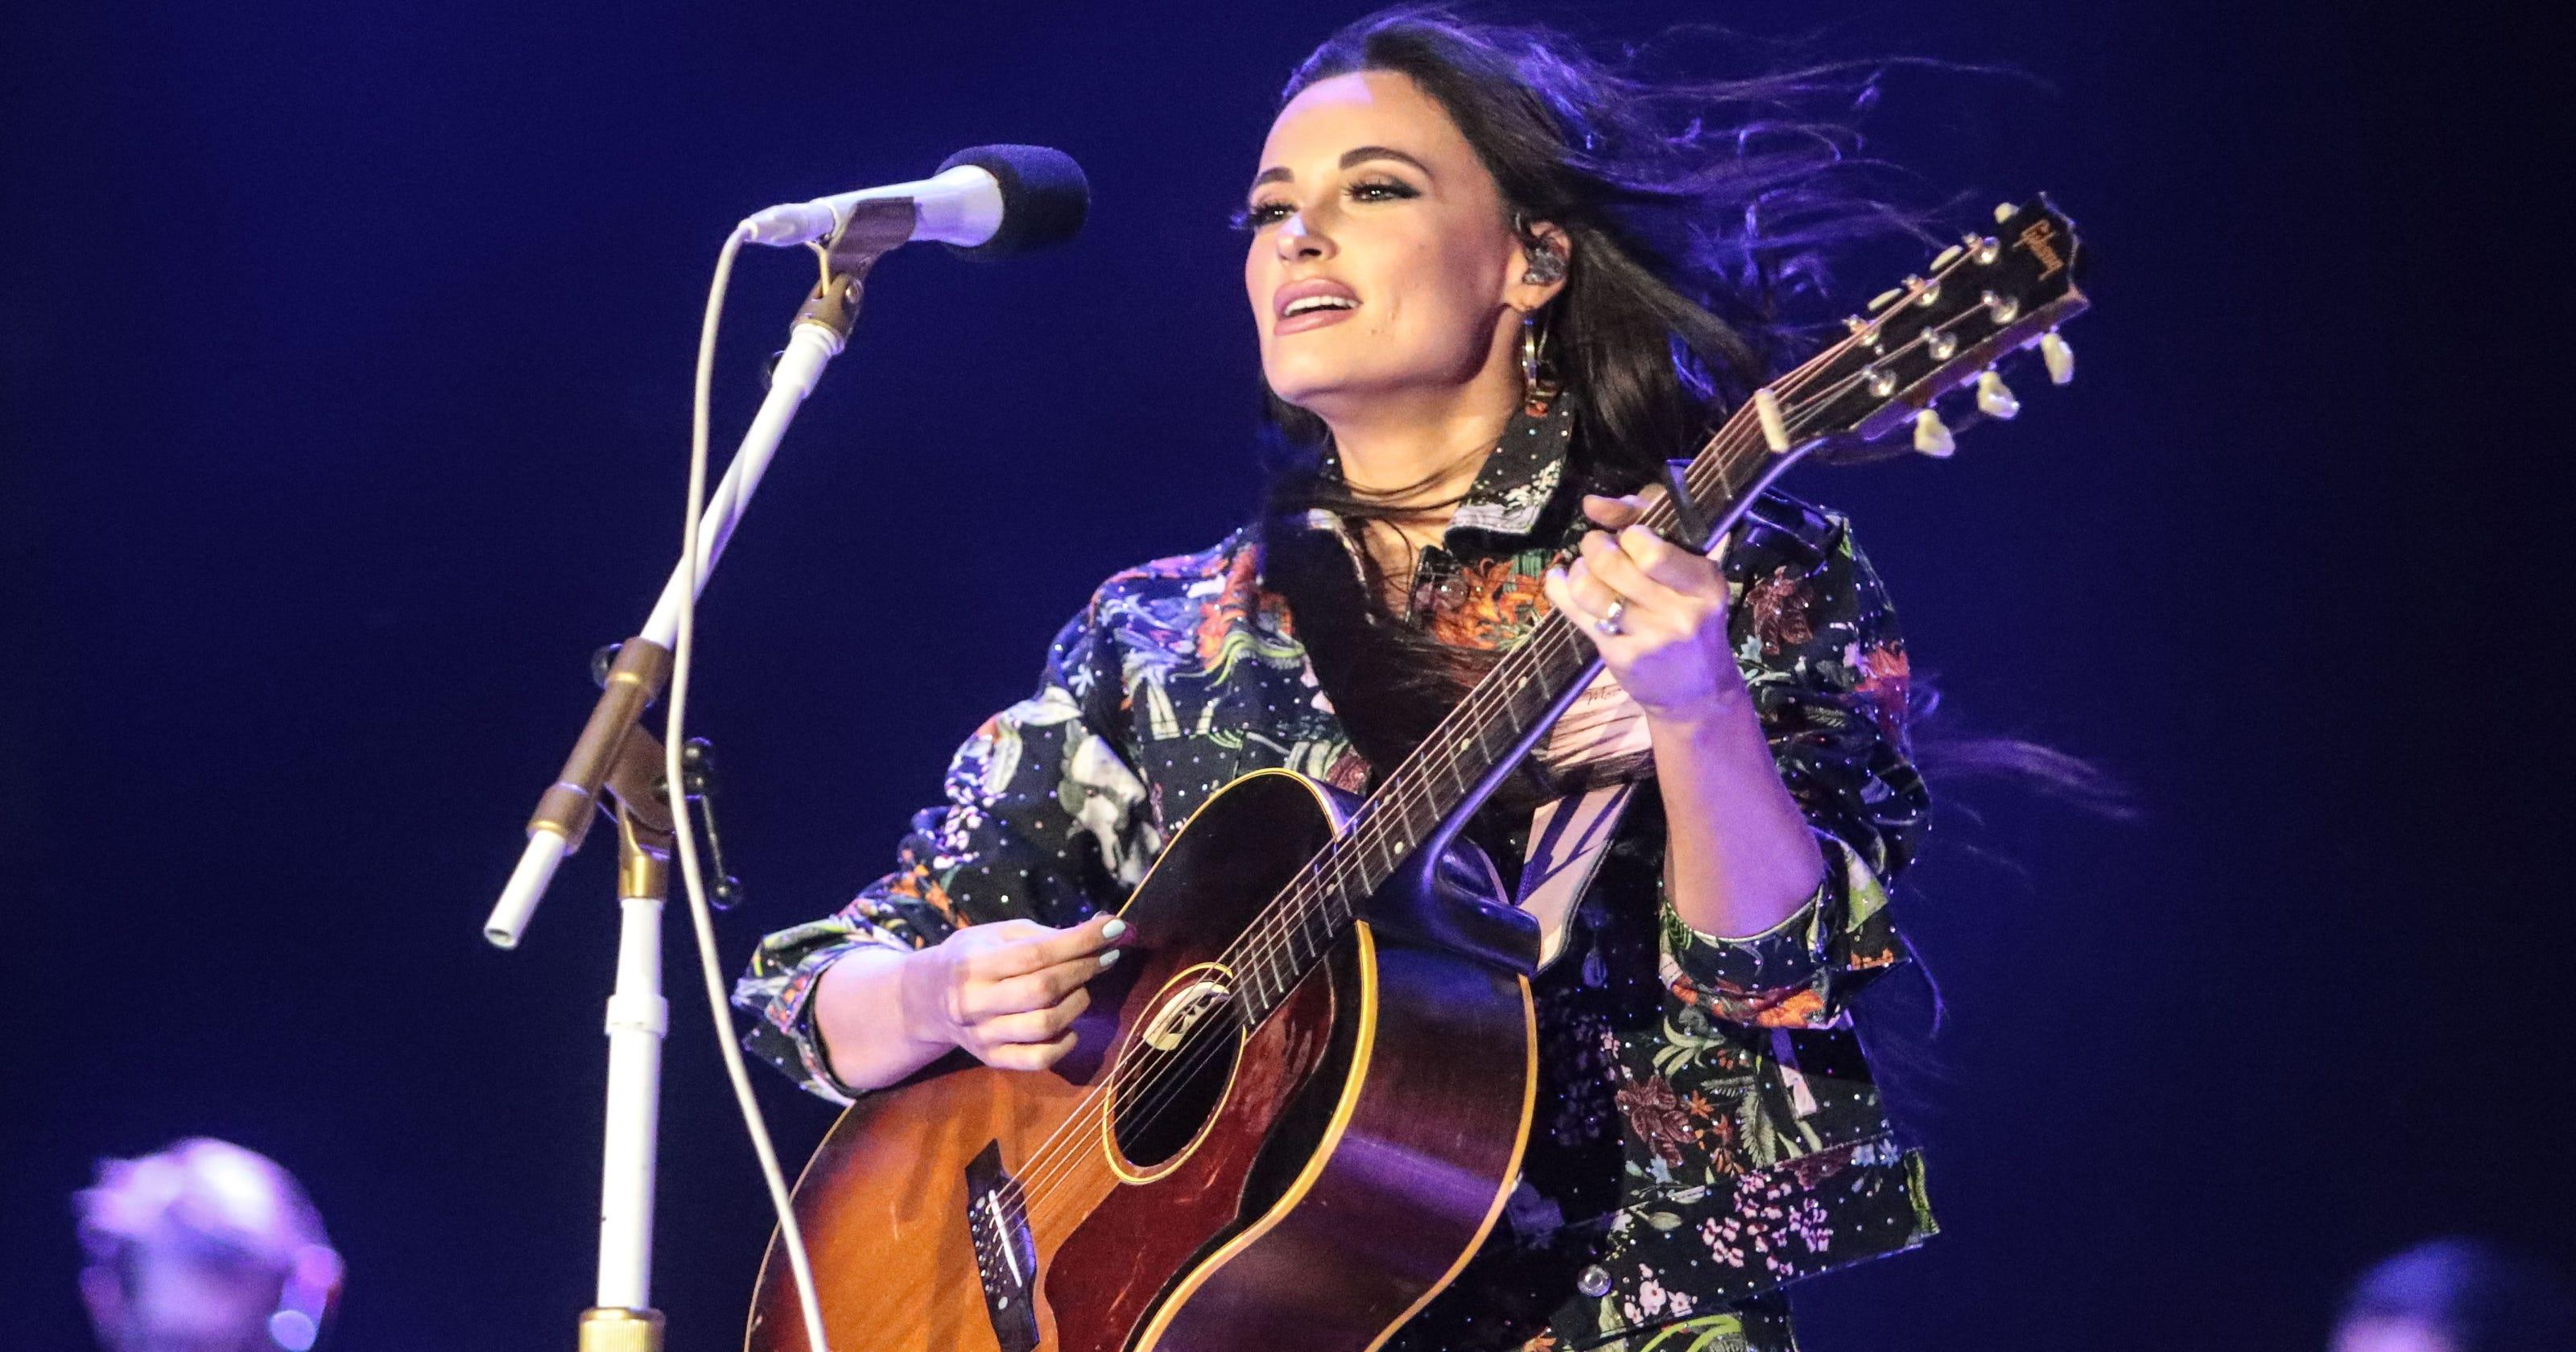 Kacey Musgraves at Ryman Auditorium: 3 nights booked in Nashville